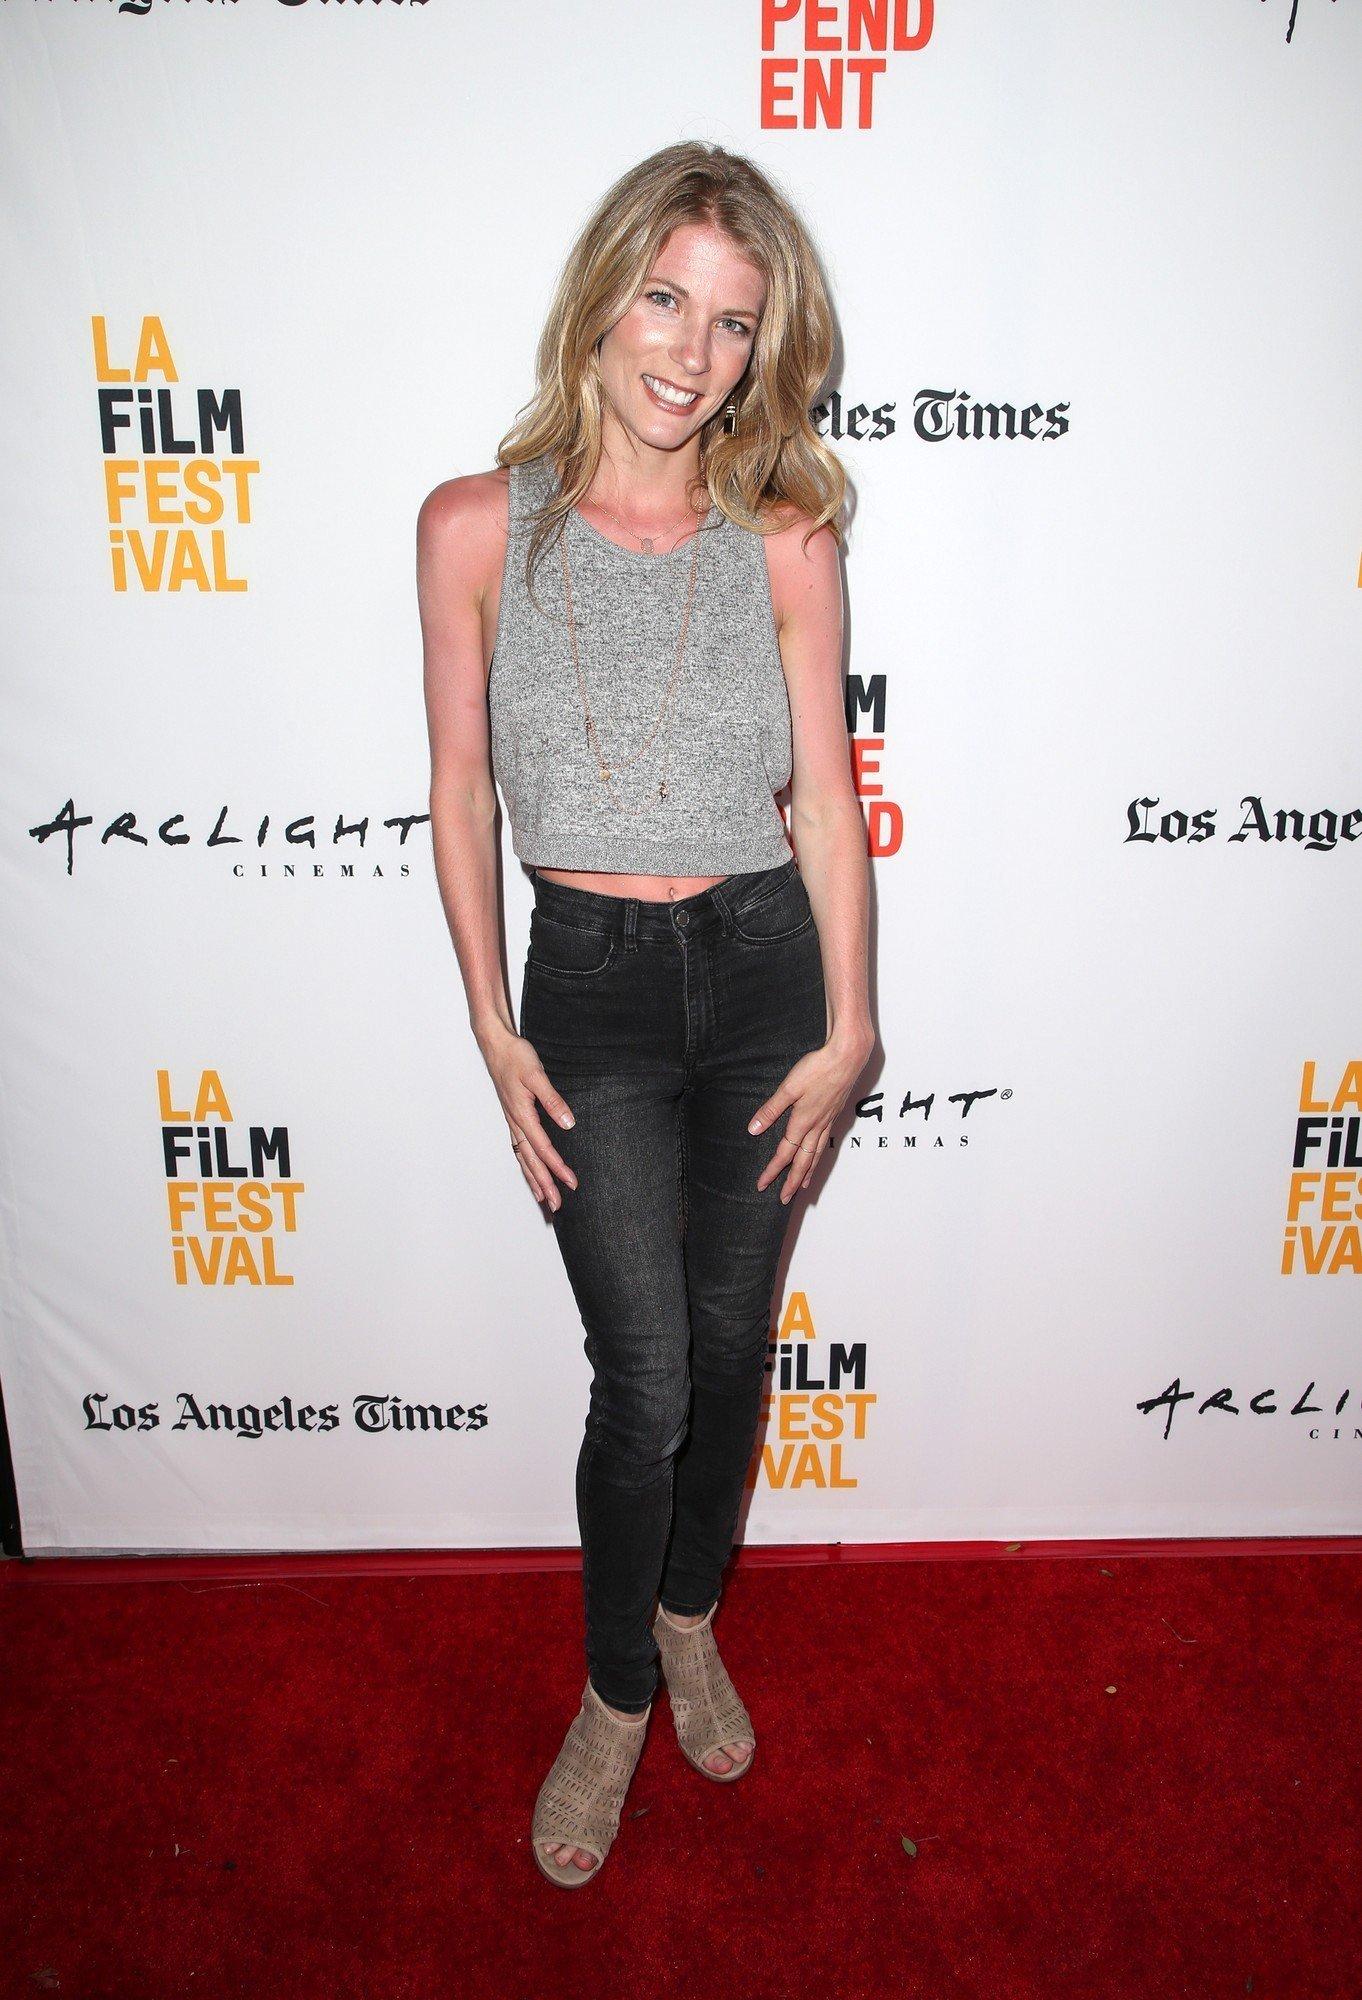 Morgan weed becks premiere at los angeles film festival nude (88 pic)